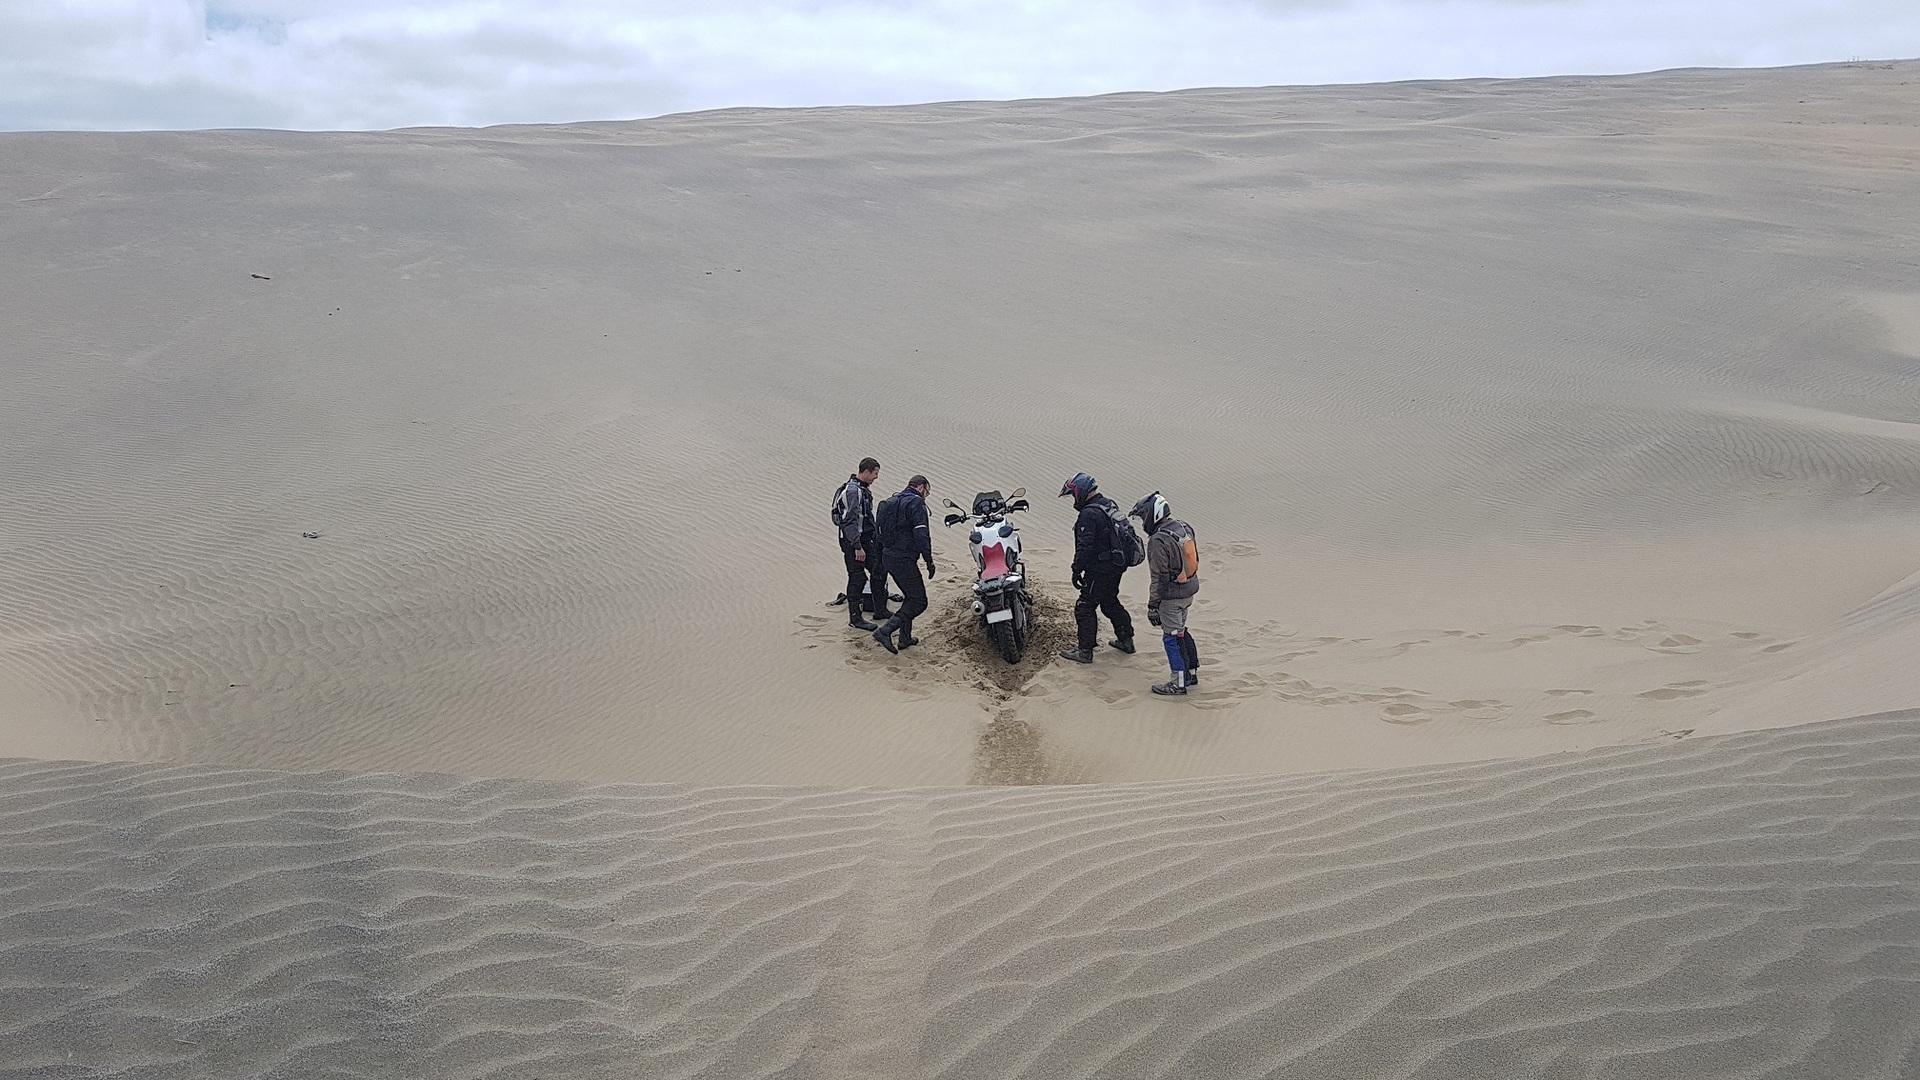 Dune Jumper